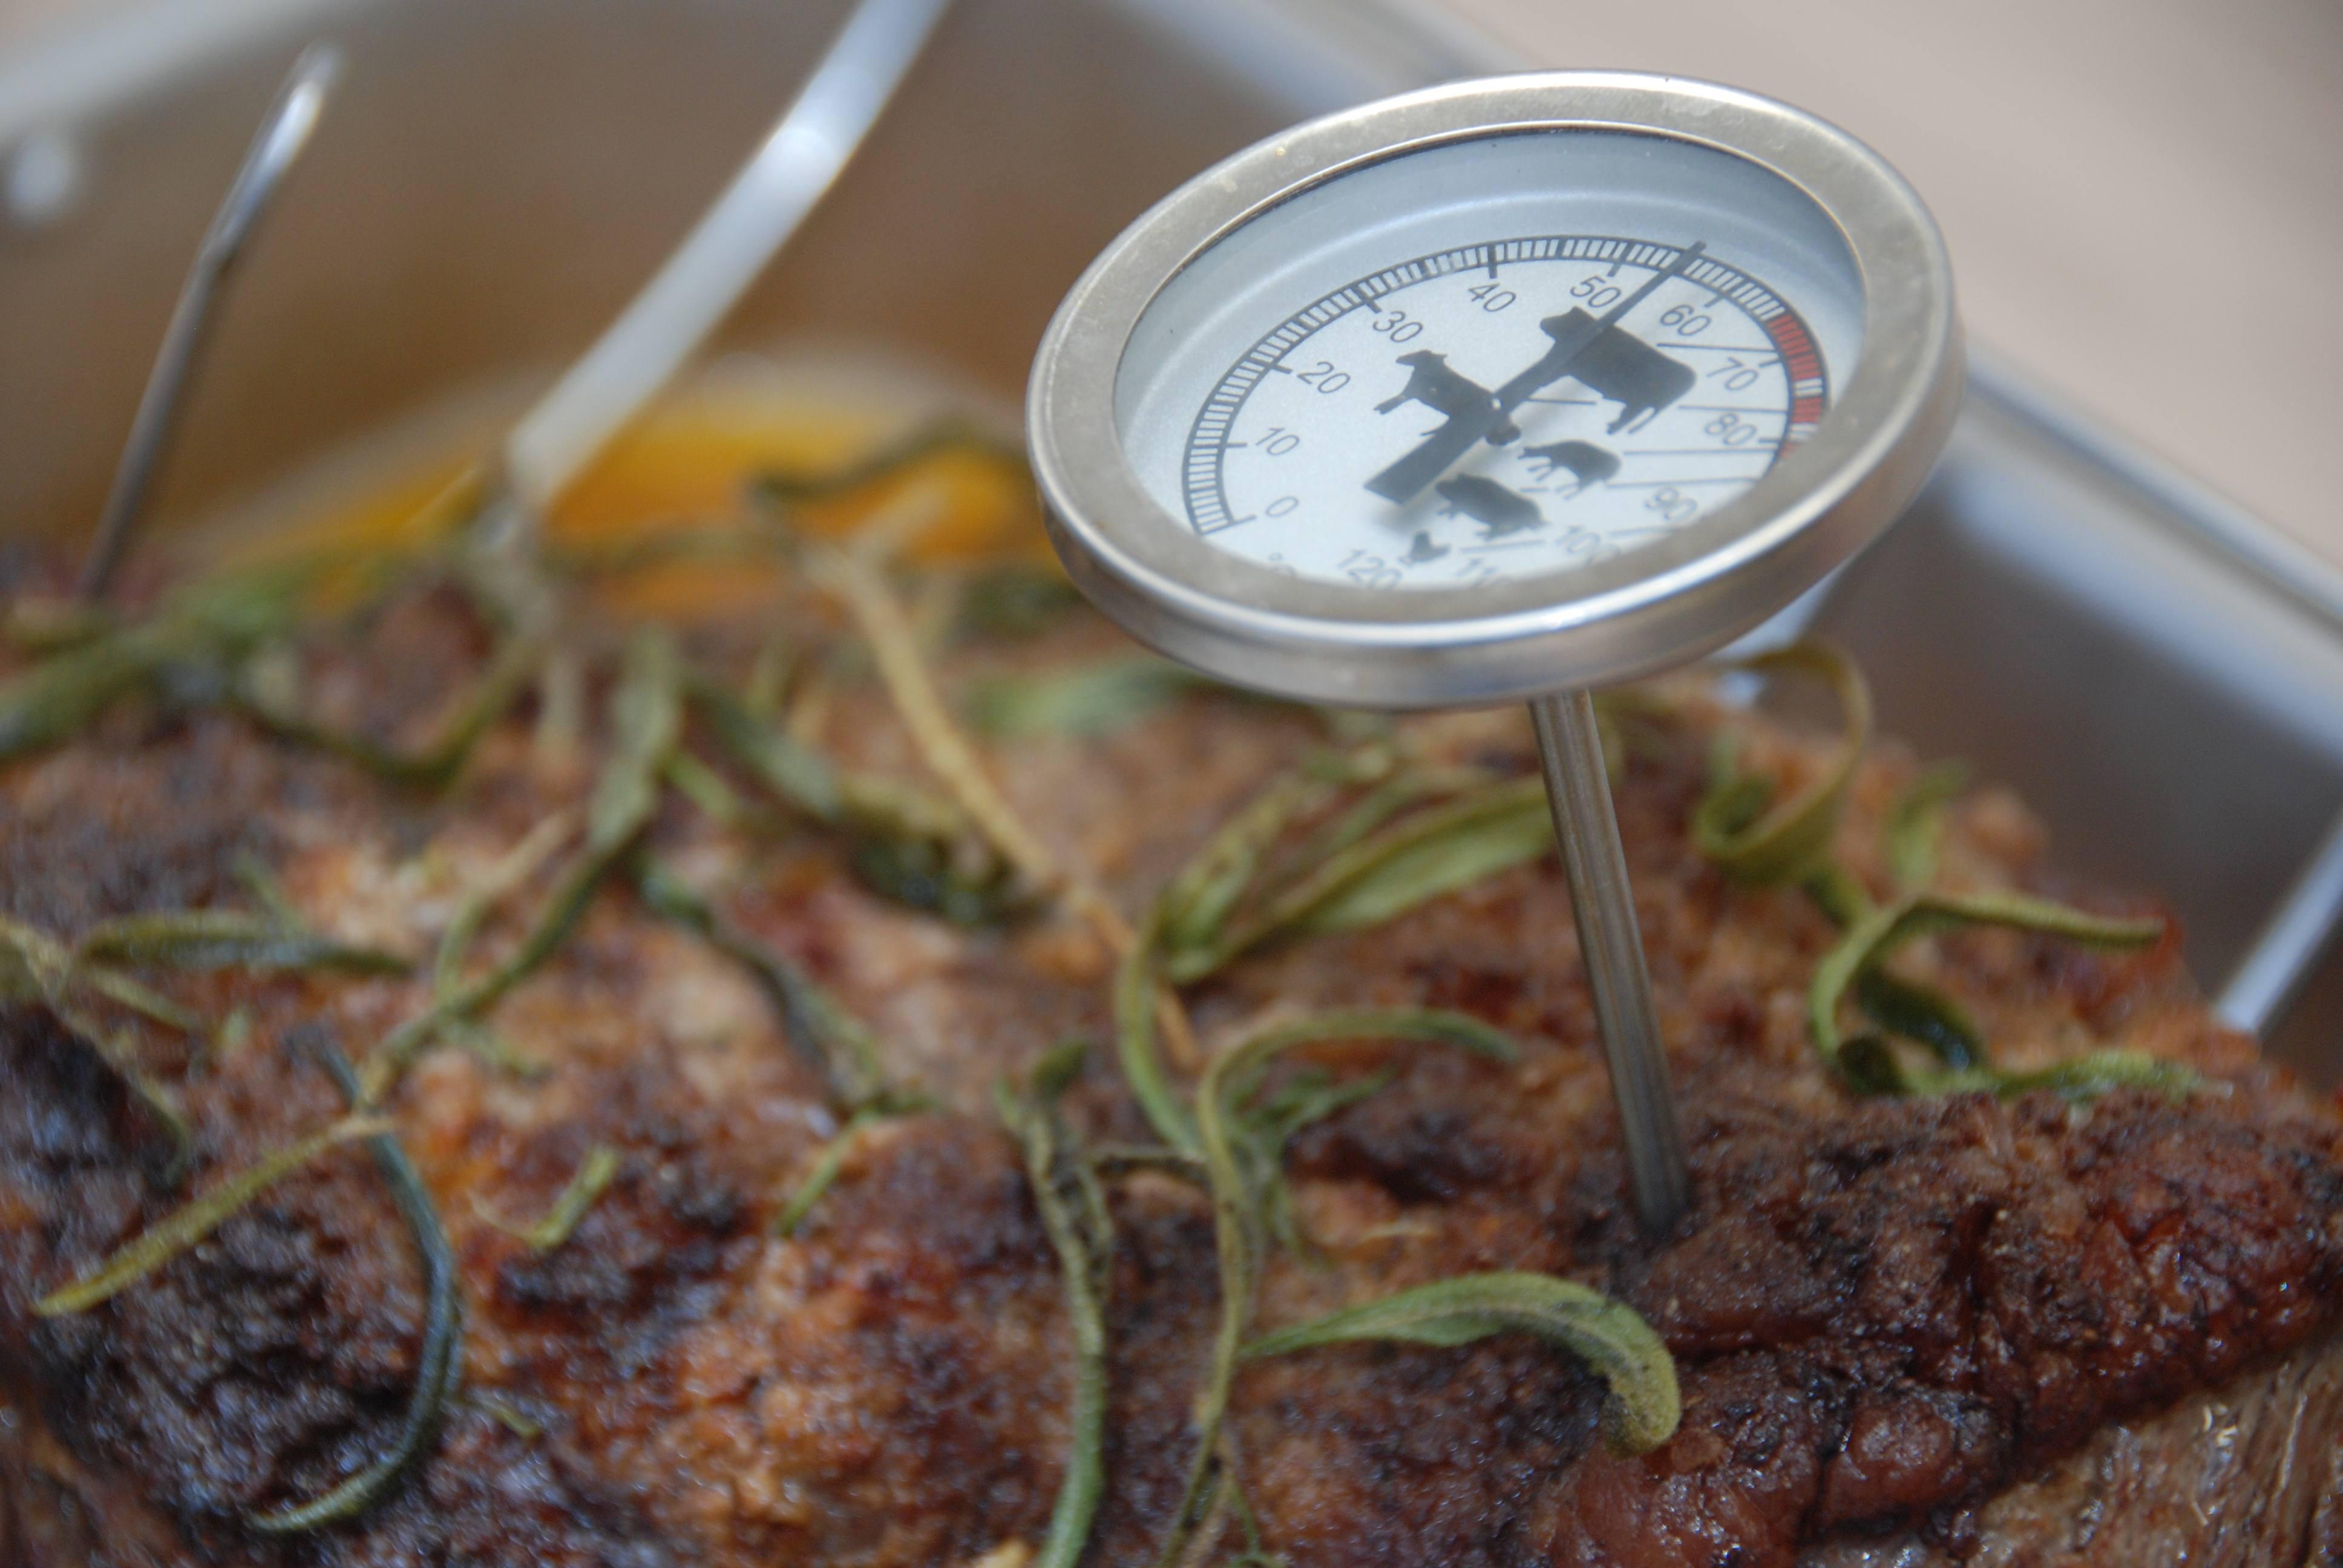 Kernetemperatur på oksekød, svinekød, kalvekød og fjerkræ